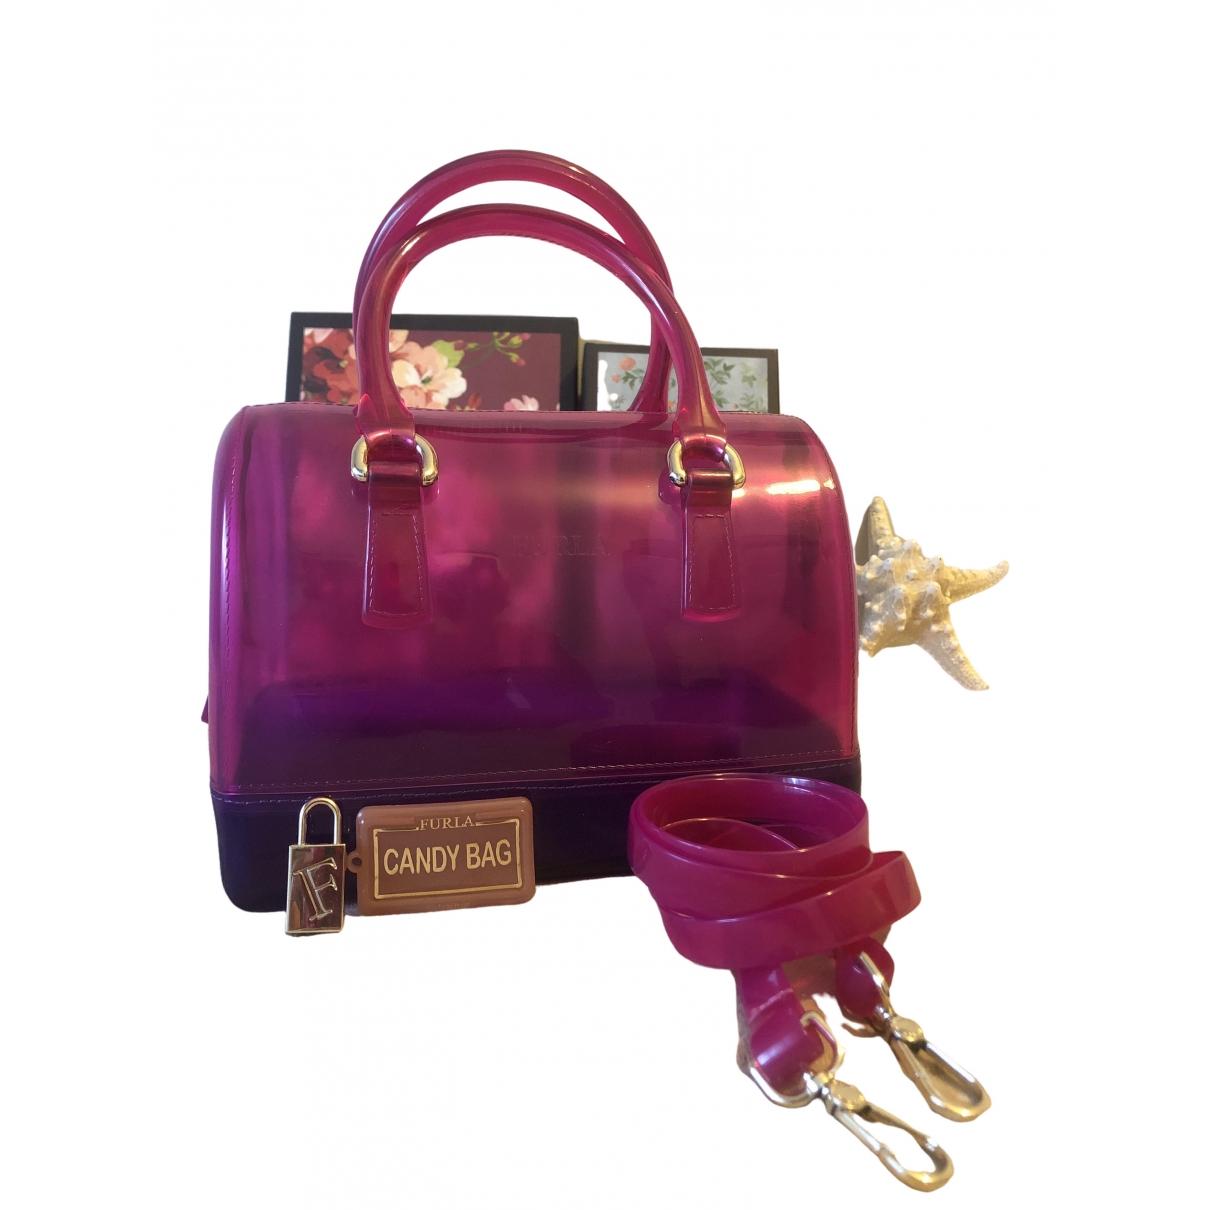 Furla Candy Bag Handtasche in  Rosa Kunststoff